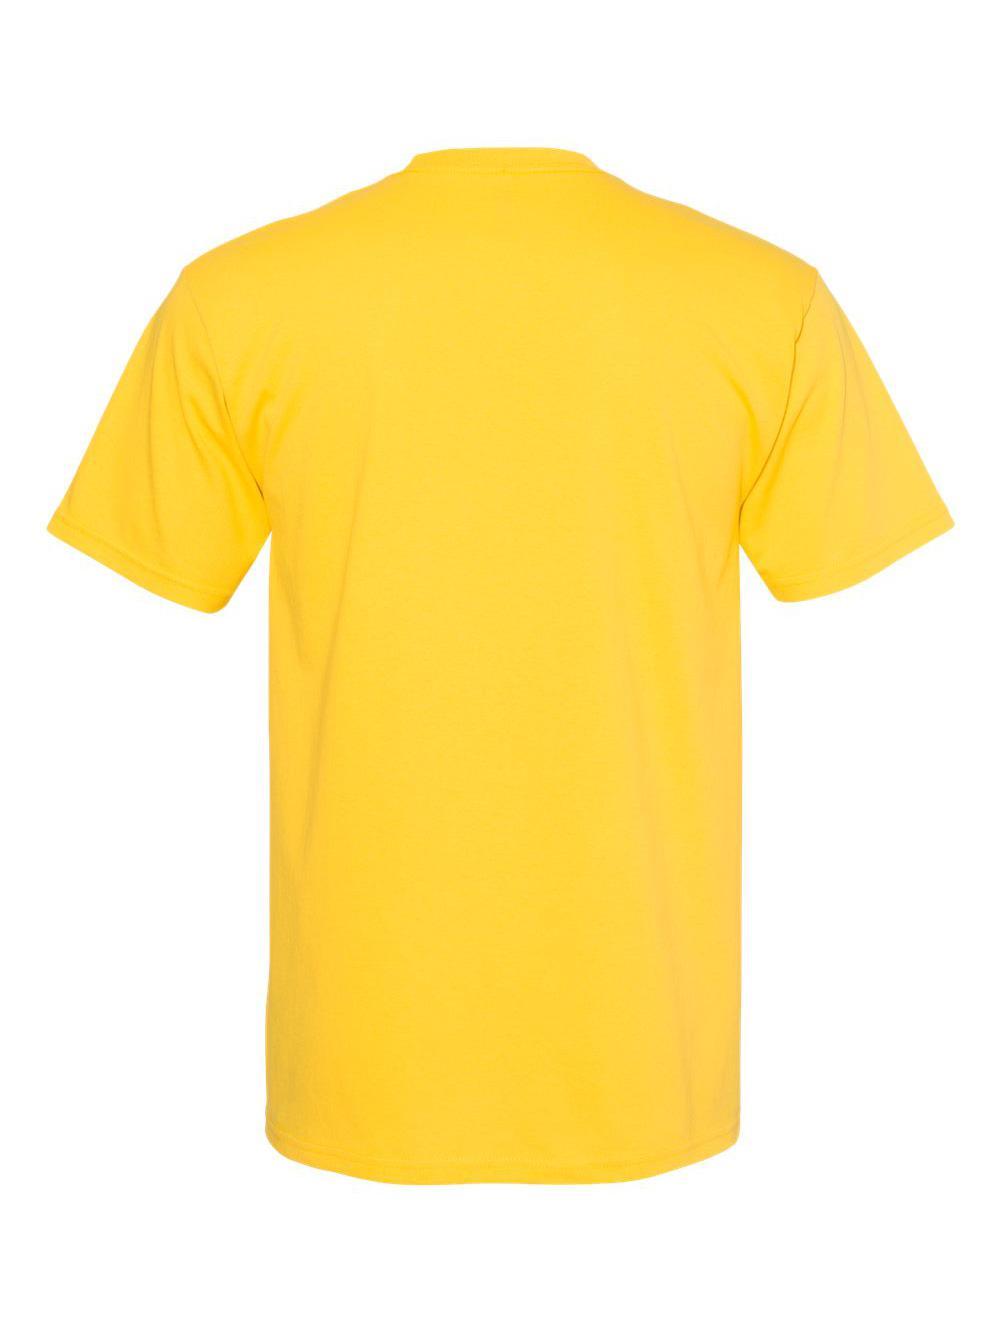 ALSTYLE-Premium-T-Shirt-1701 thumbnail 74